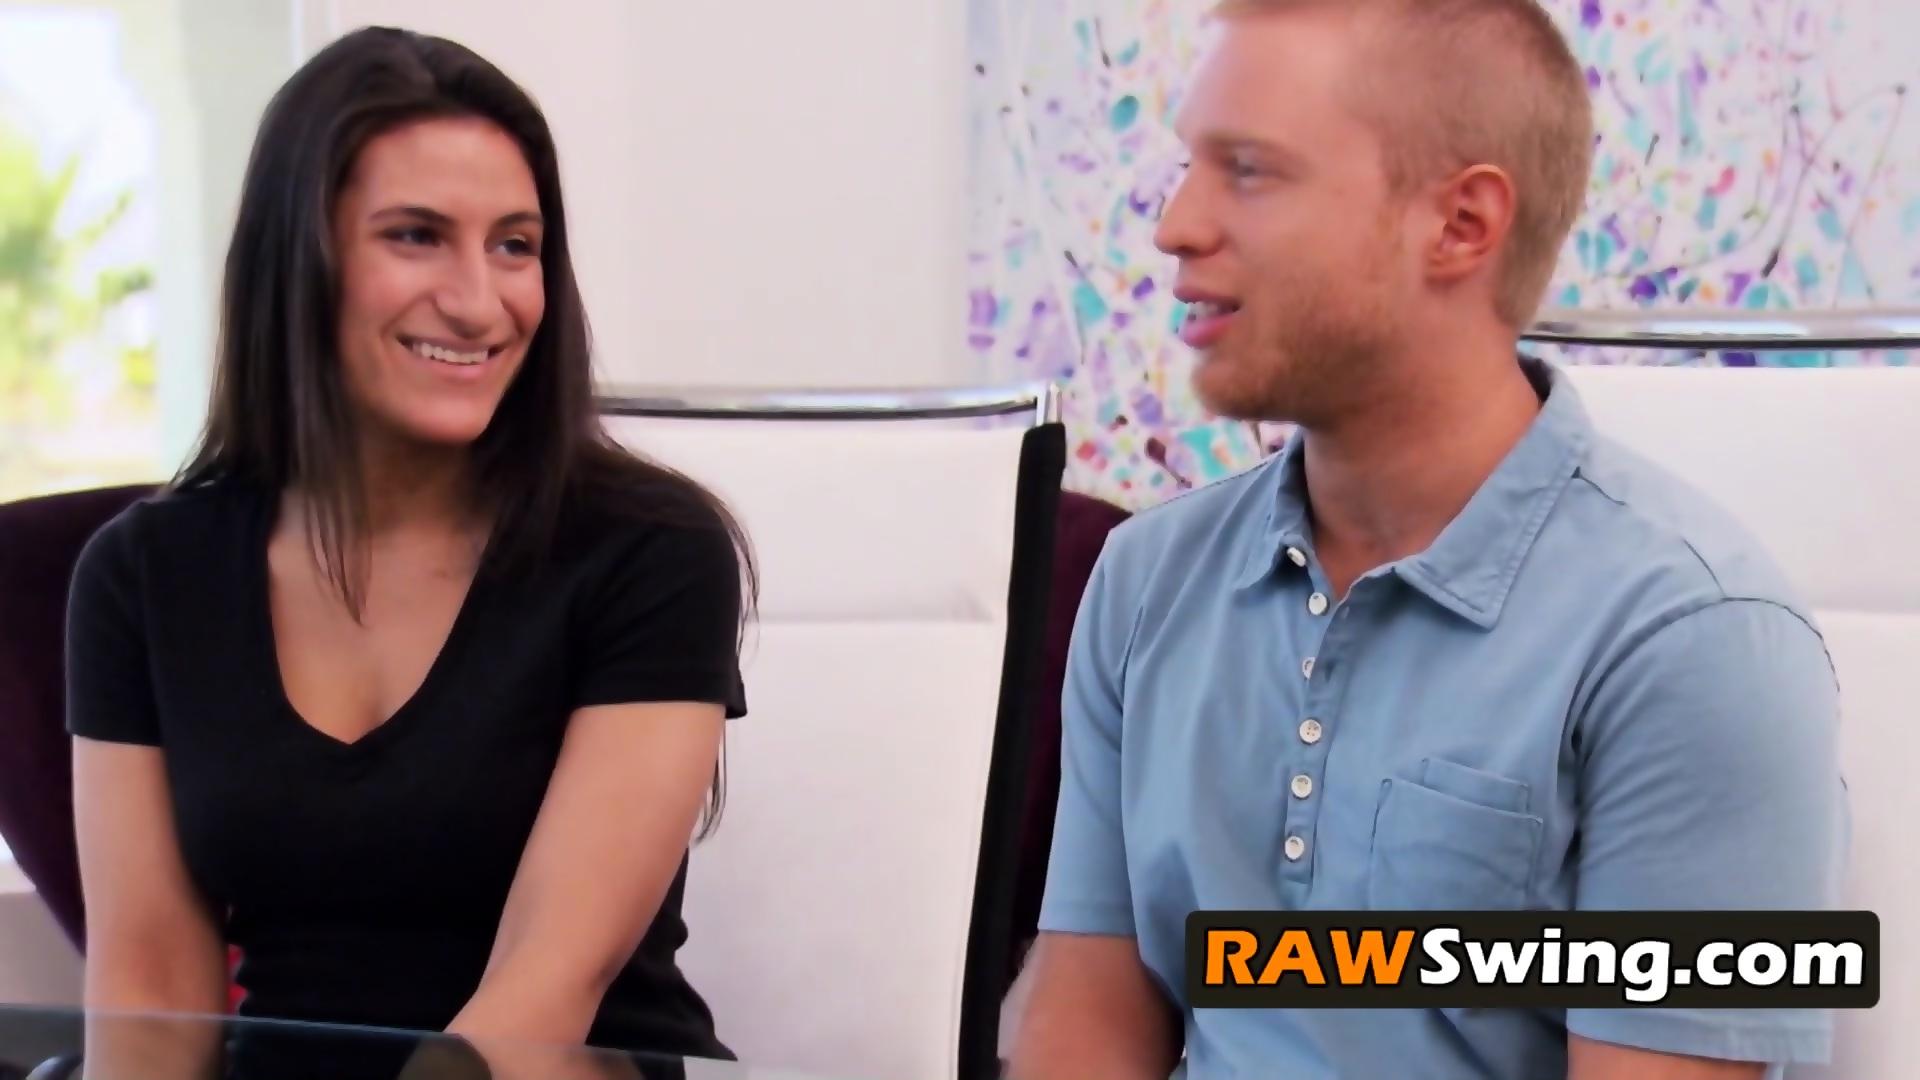 Meet swinger couples